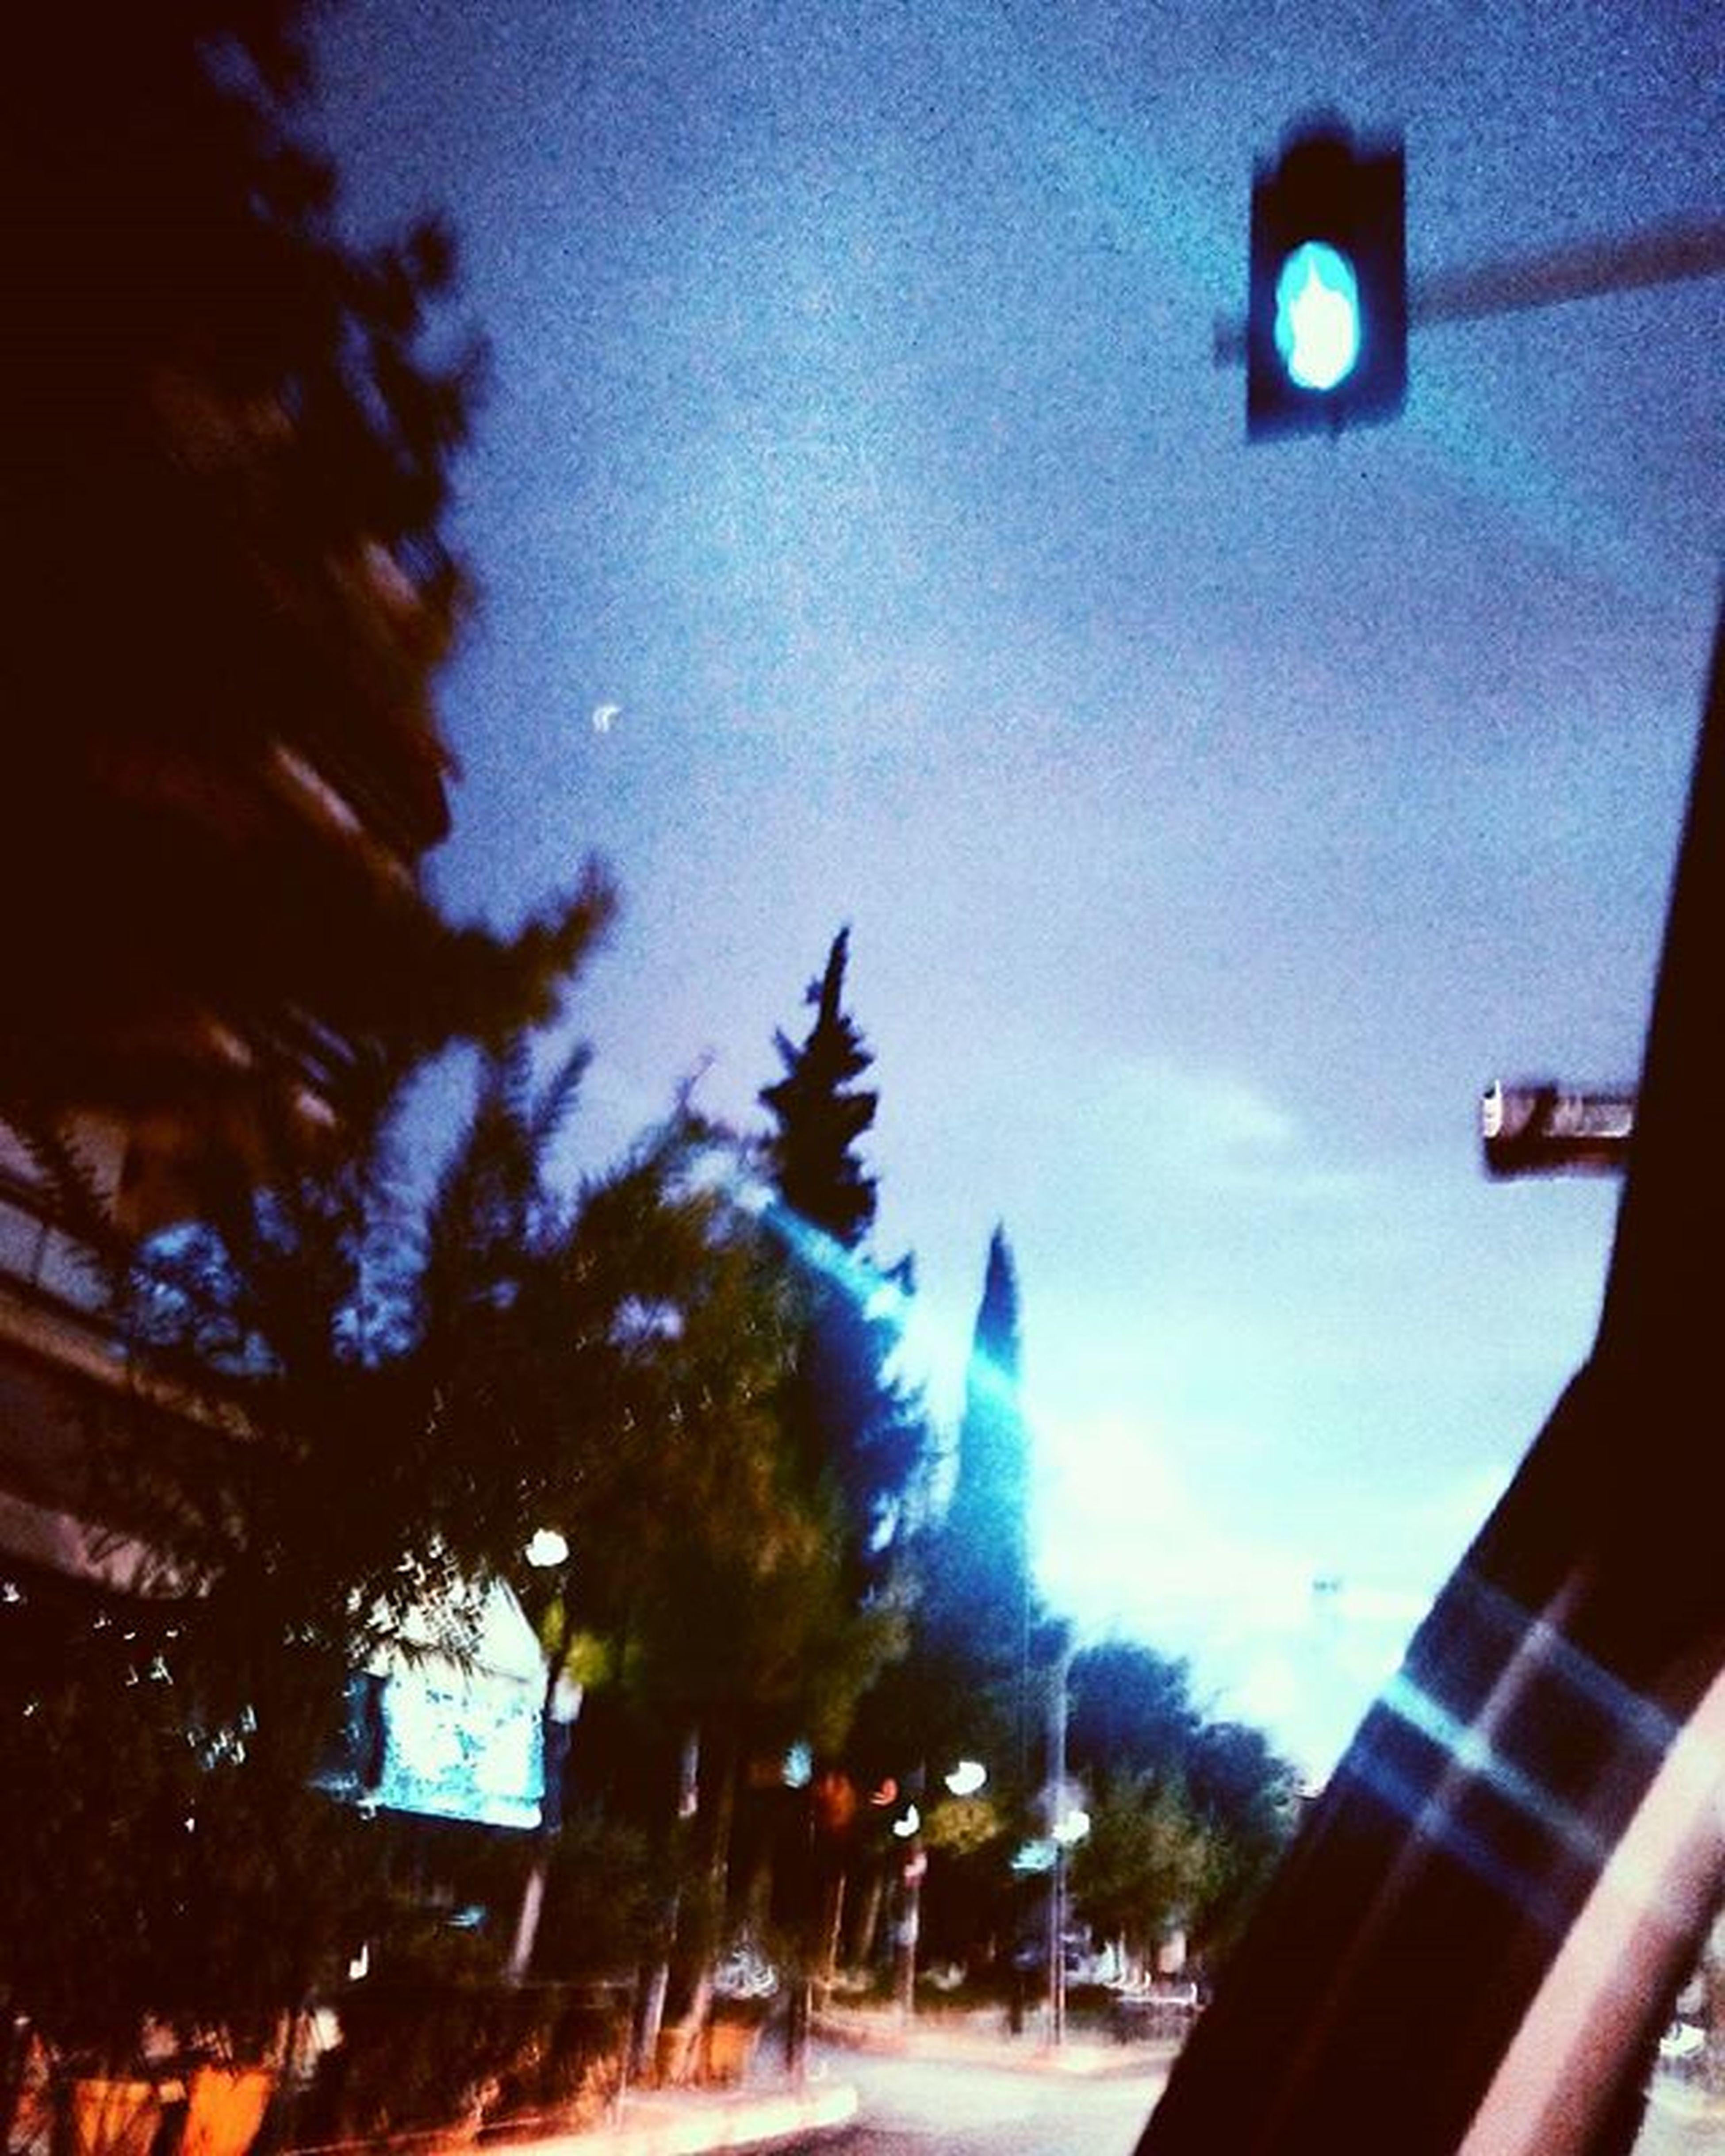 ➰🔷Blue mornings.🌙🌓 Gmorningworld Tuesdaymorning Lights Sky Blue Myviewrightnow Trafficlight Car NeedCoffee Sodesperately Amywhinehouse BackToBlack Mysoundtrack Headphones Lovethesoul Asamysaid Dream Live Fight Staystrong